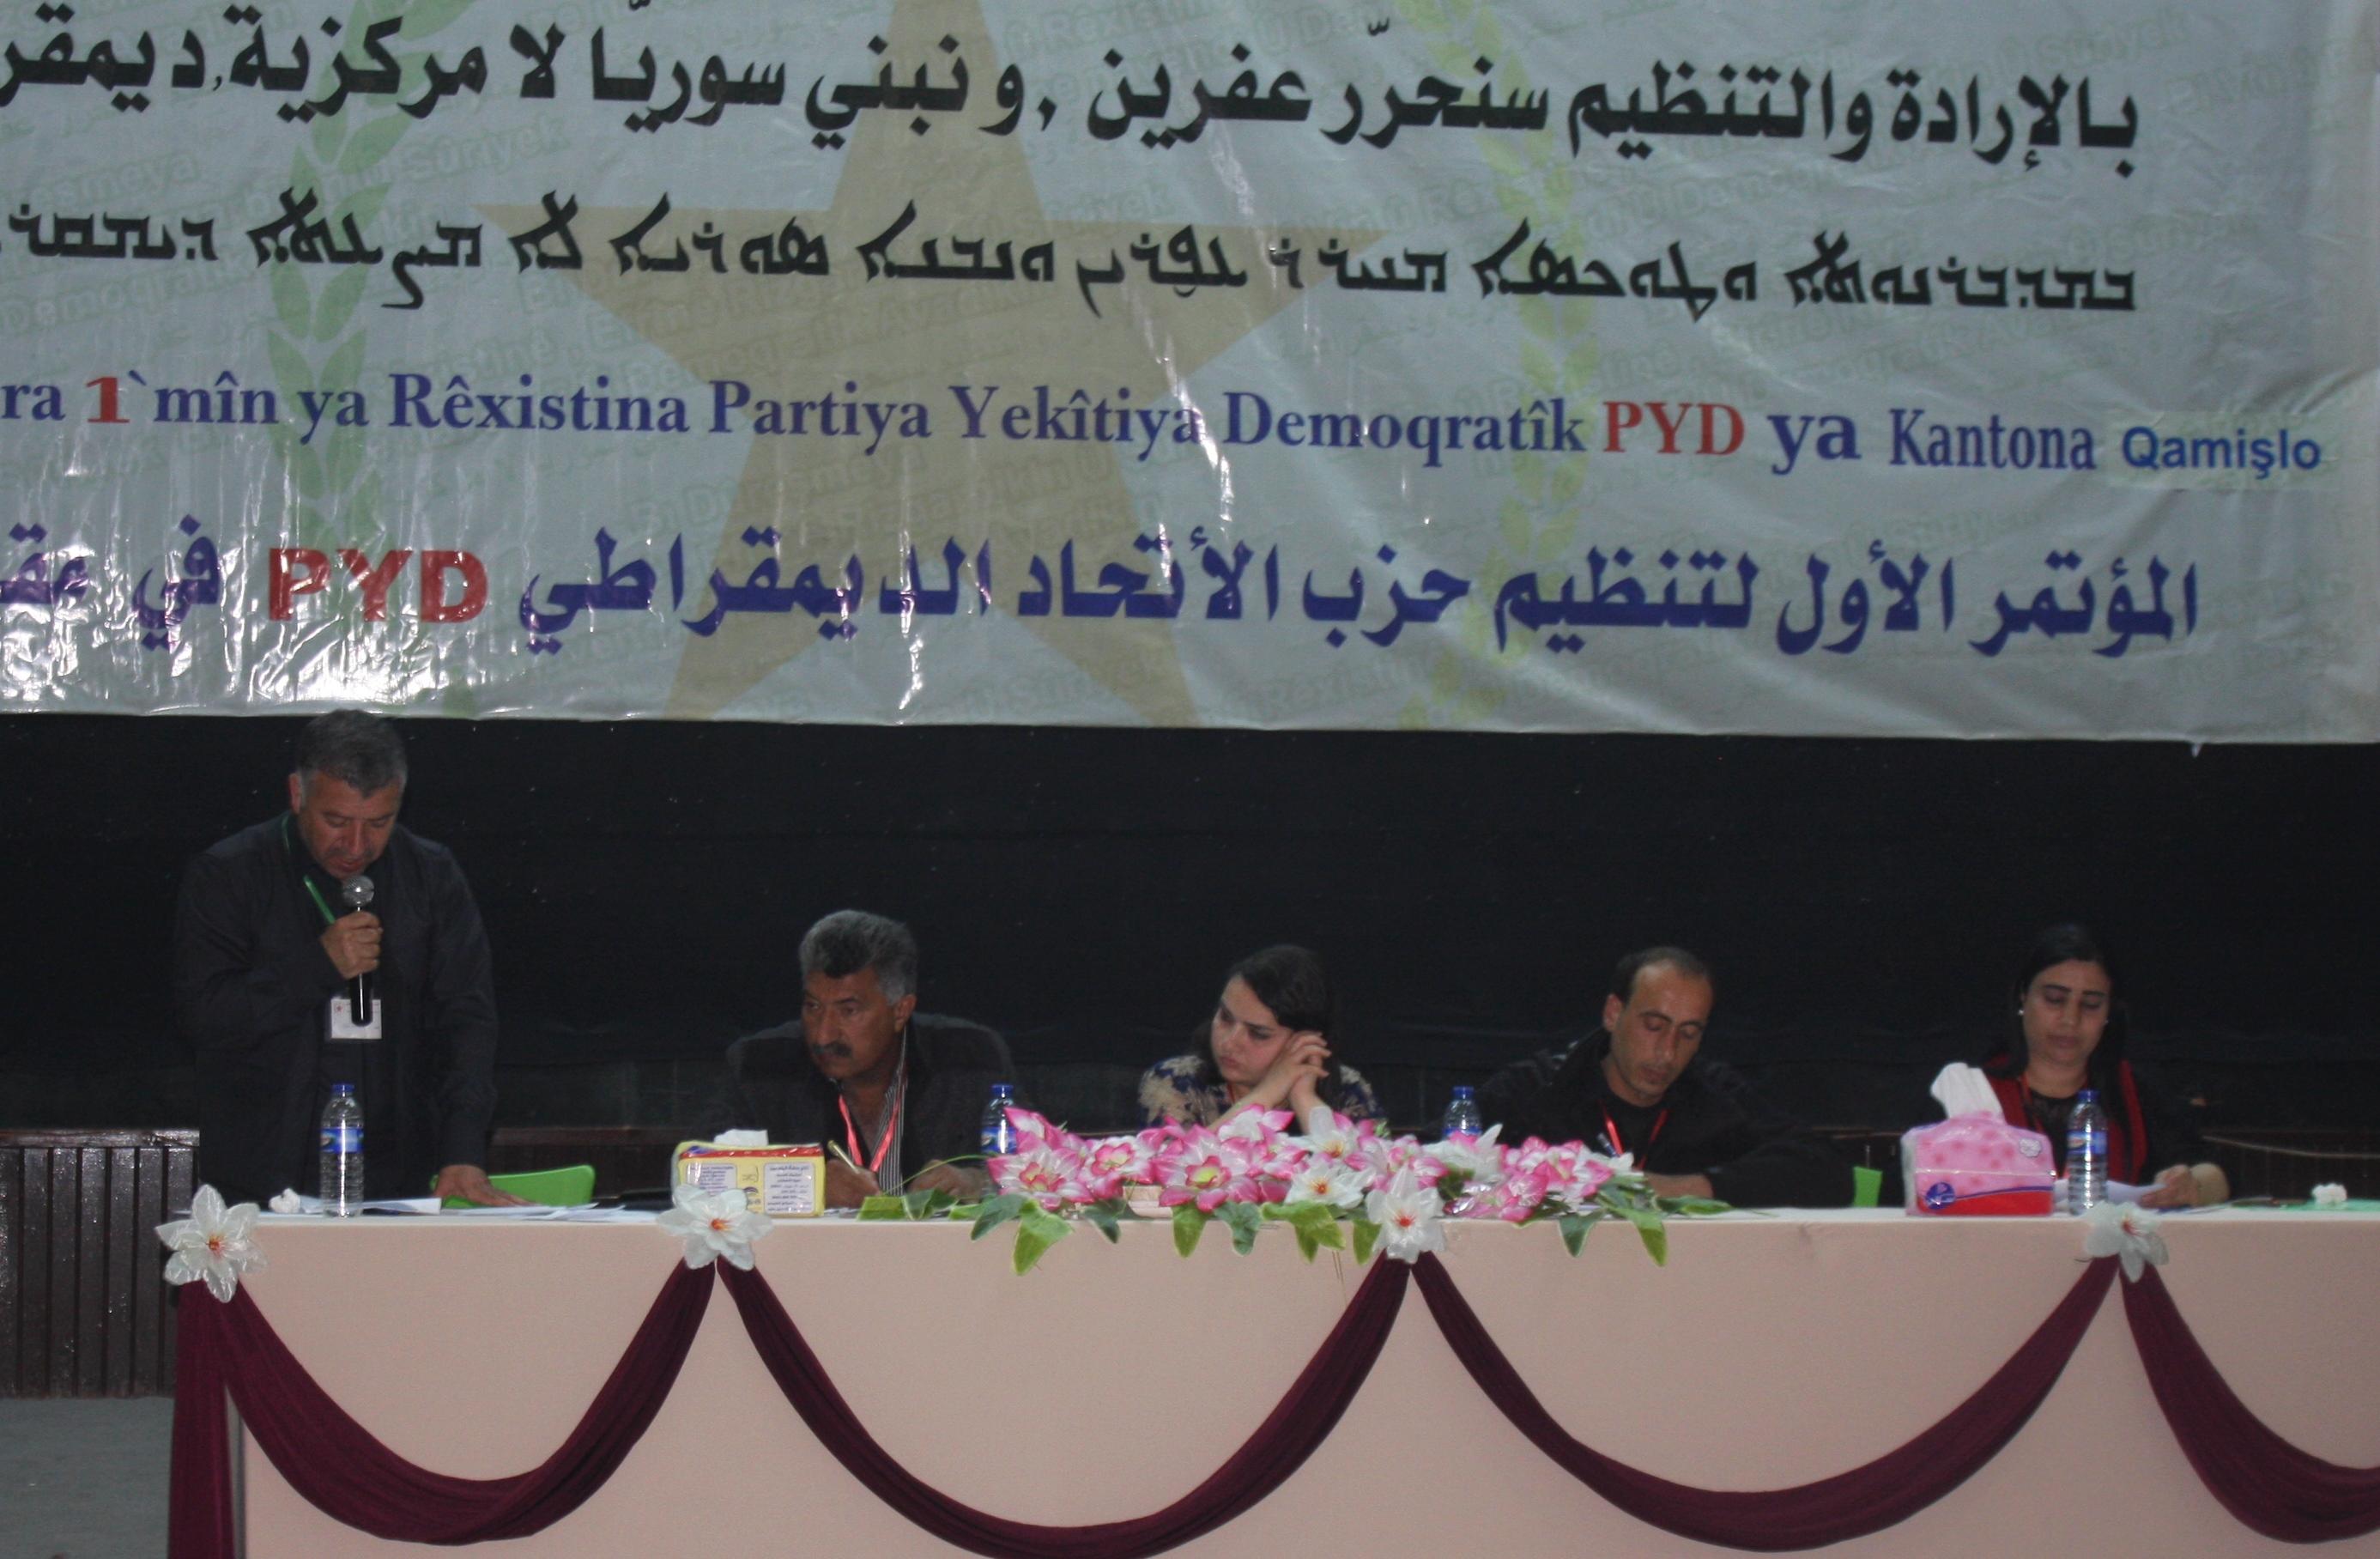 Photo of المؤتمر الأول لتنظيم الـPYD في مقاطعة قامشلو يستمر بالتصديق على جملة مقترحات